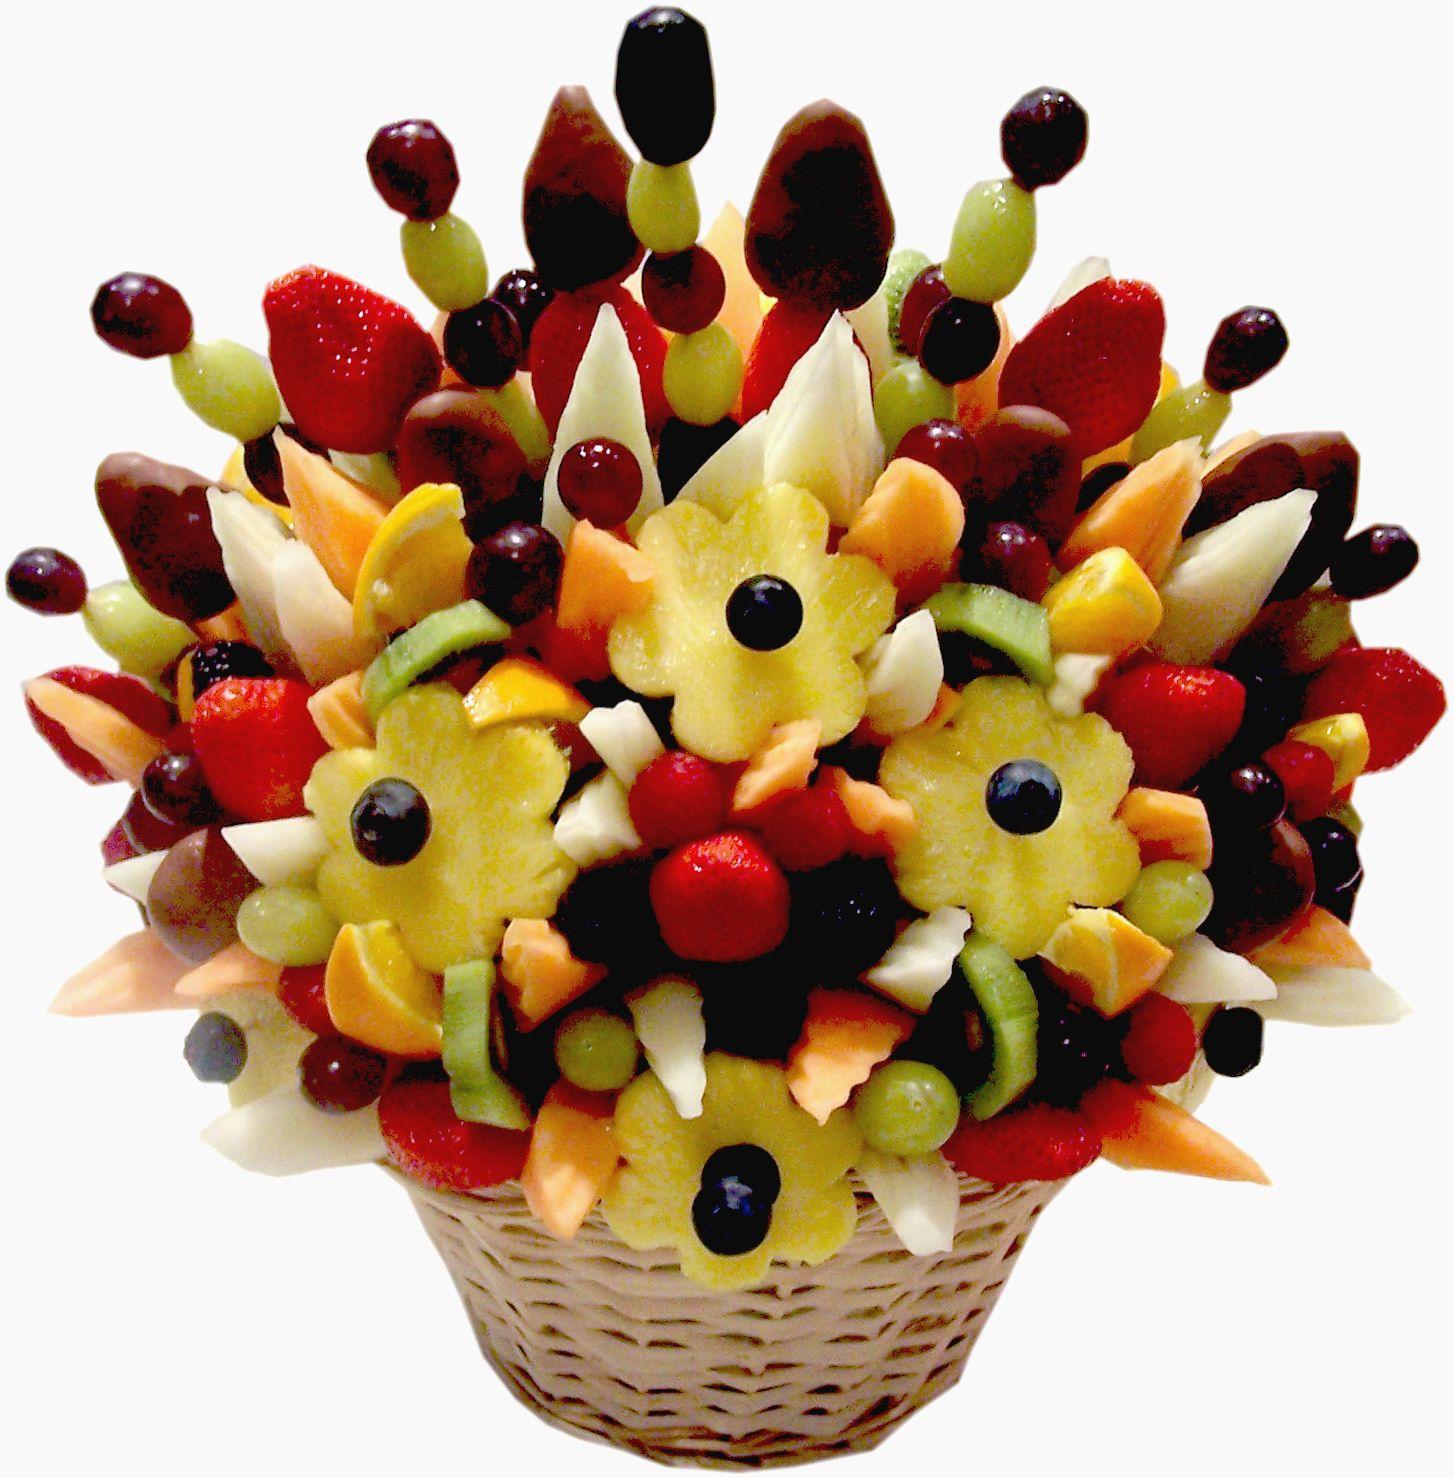 Pin by kim pinkerton on products i love pinterest fruit fruit visit izmirmasajfo